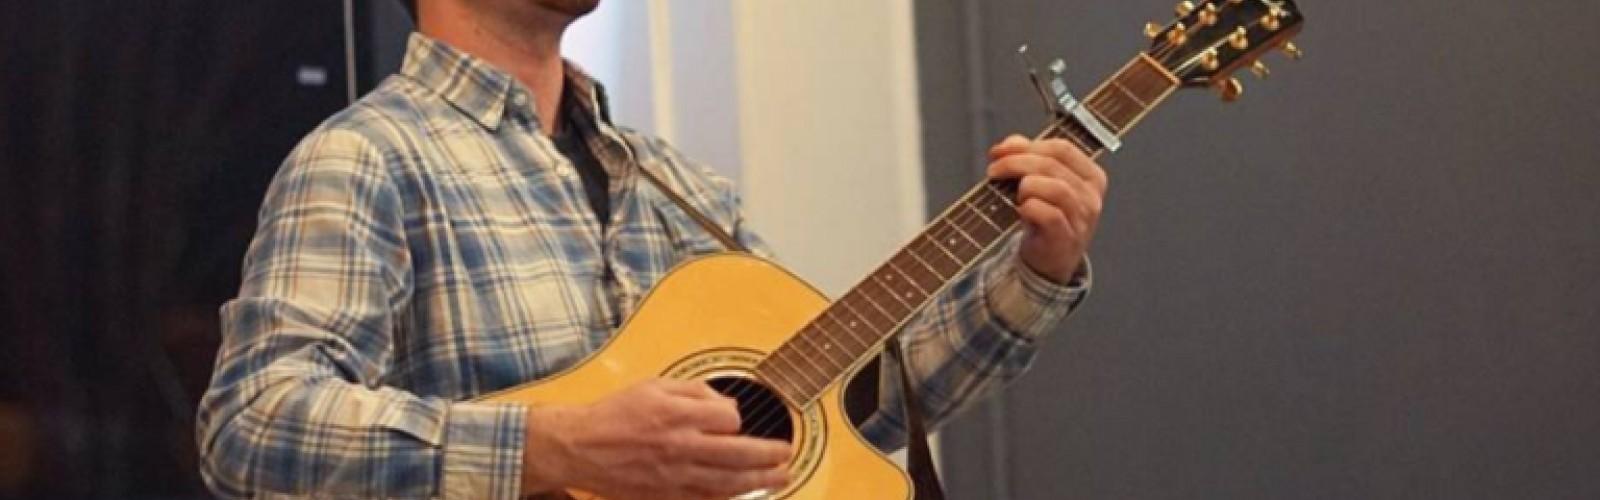 Midday Music: Luke Juday